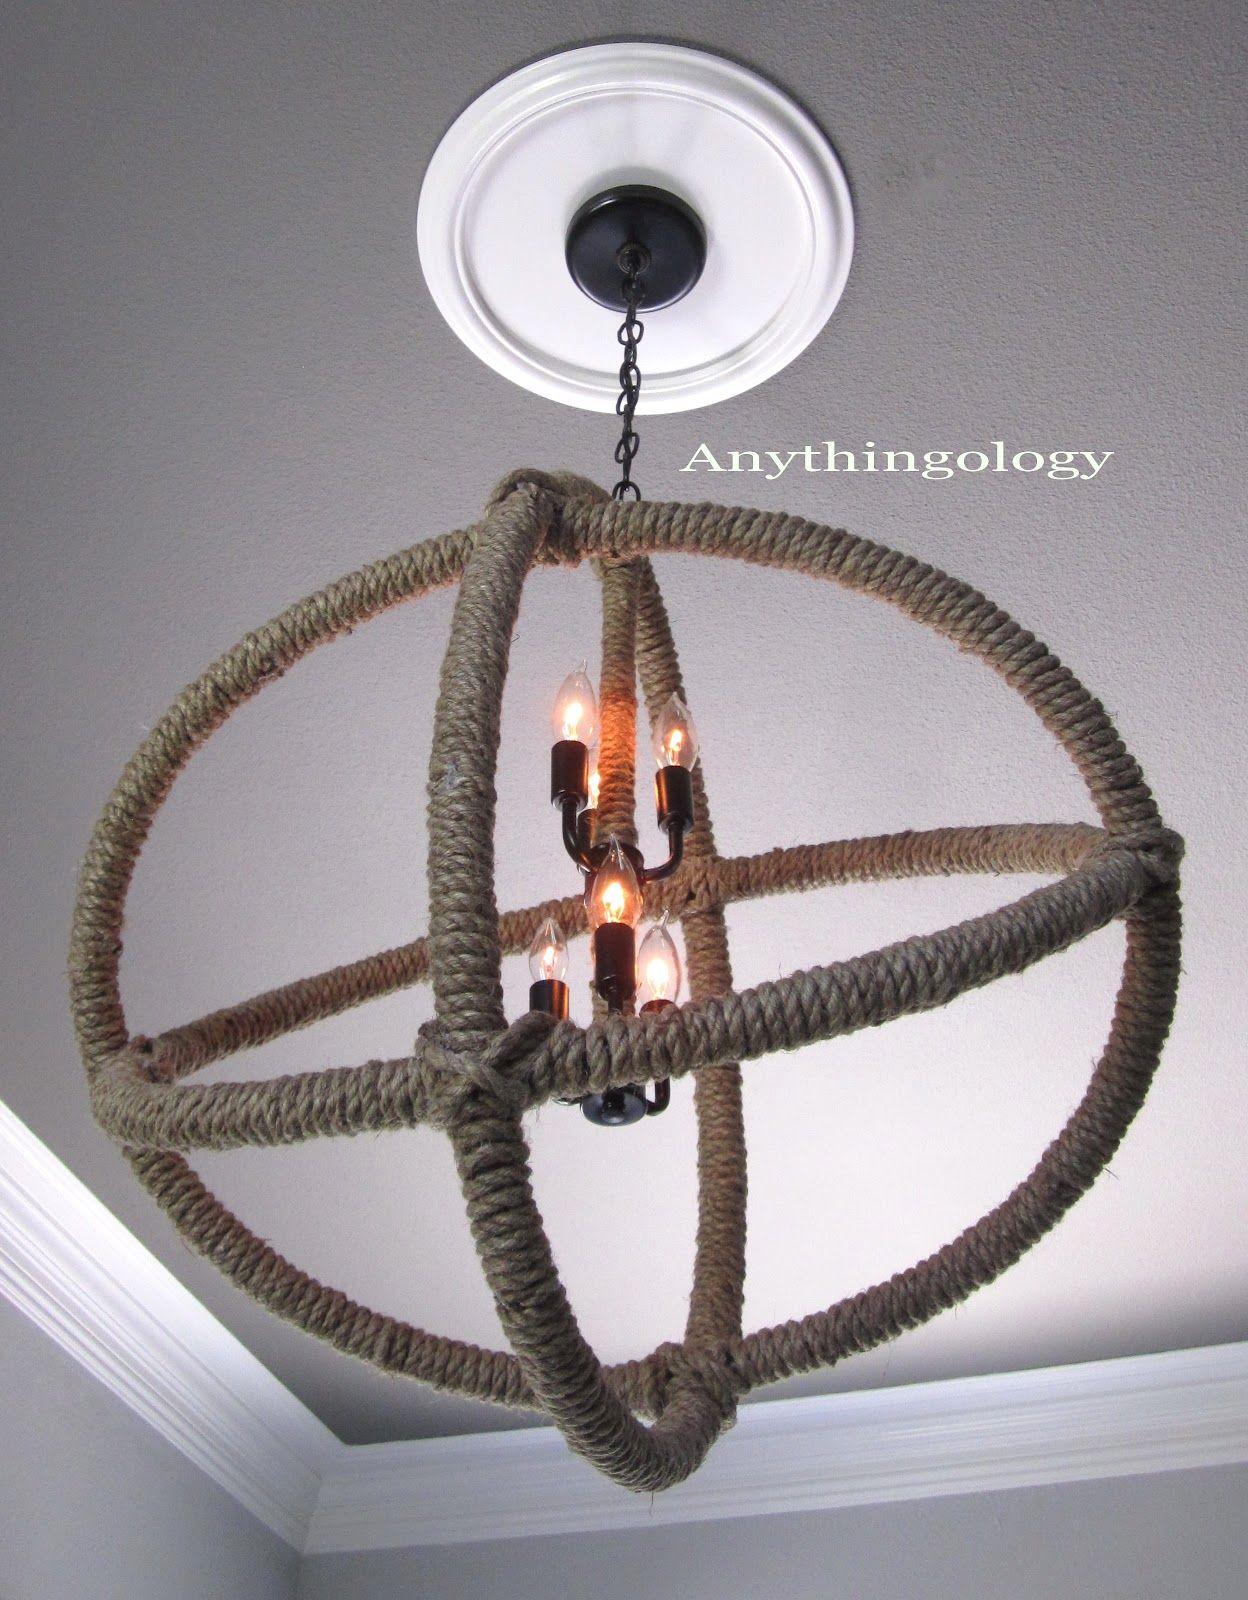 Anythingology 4 Jute Light Diy Chandelier Restoration